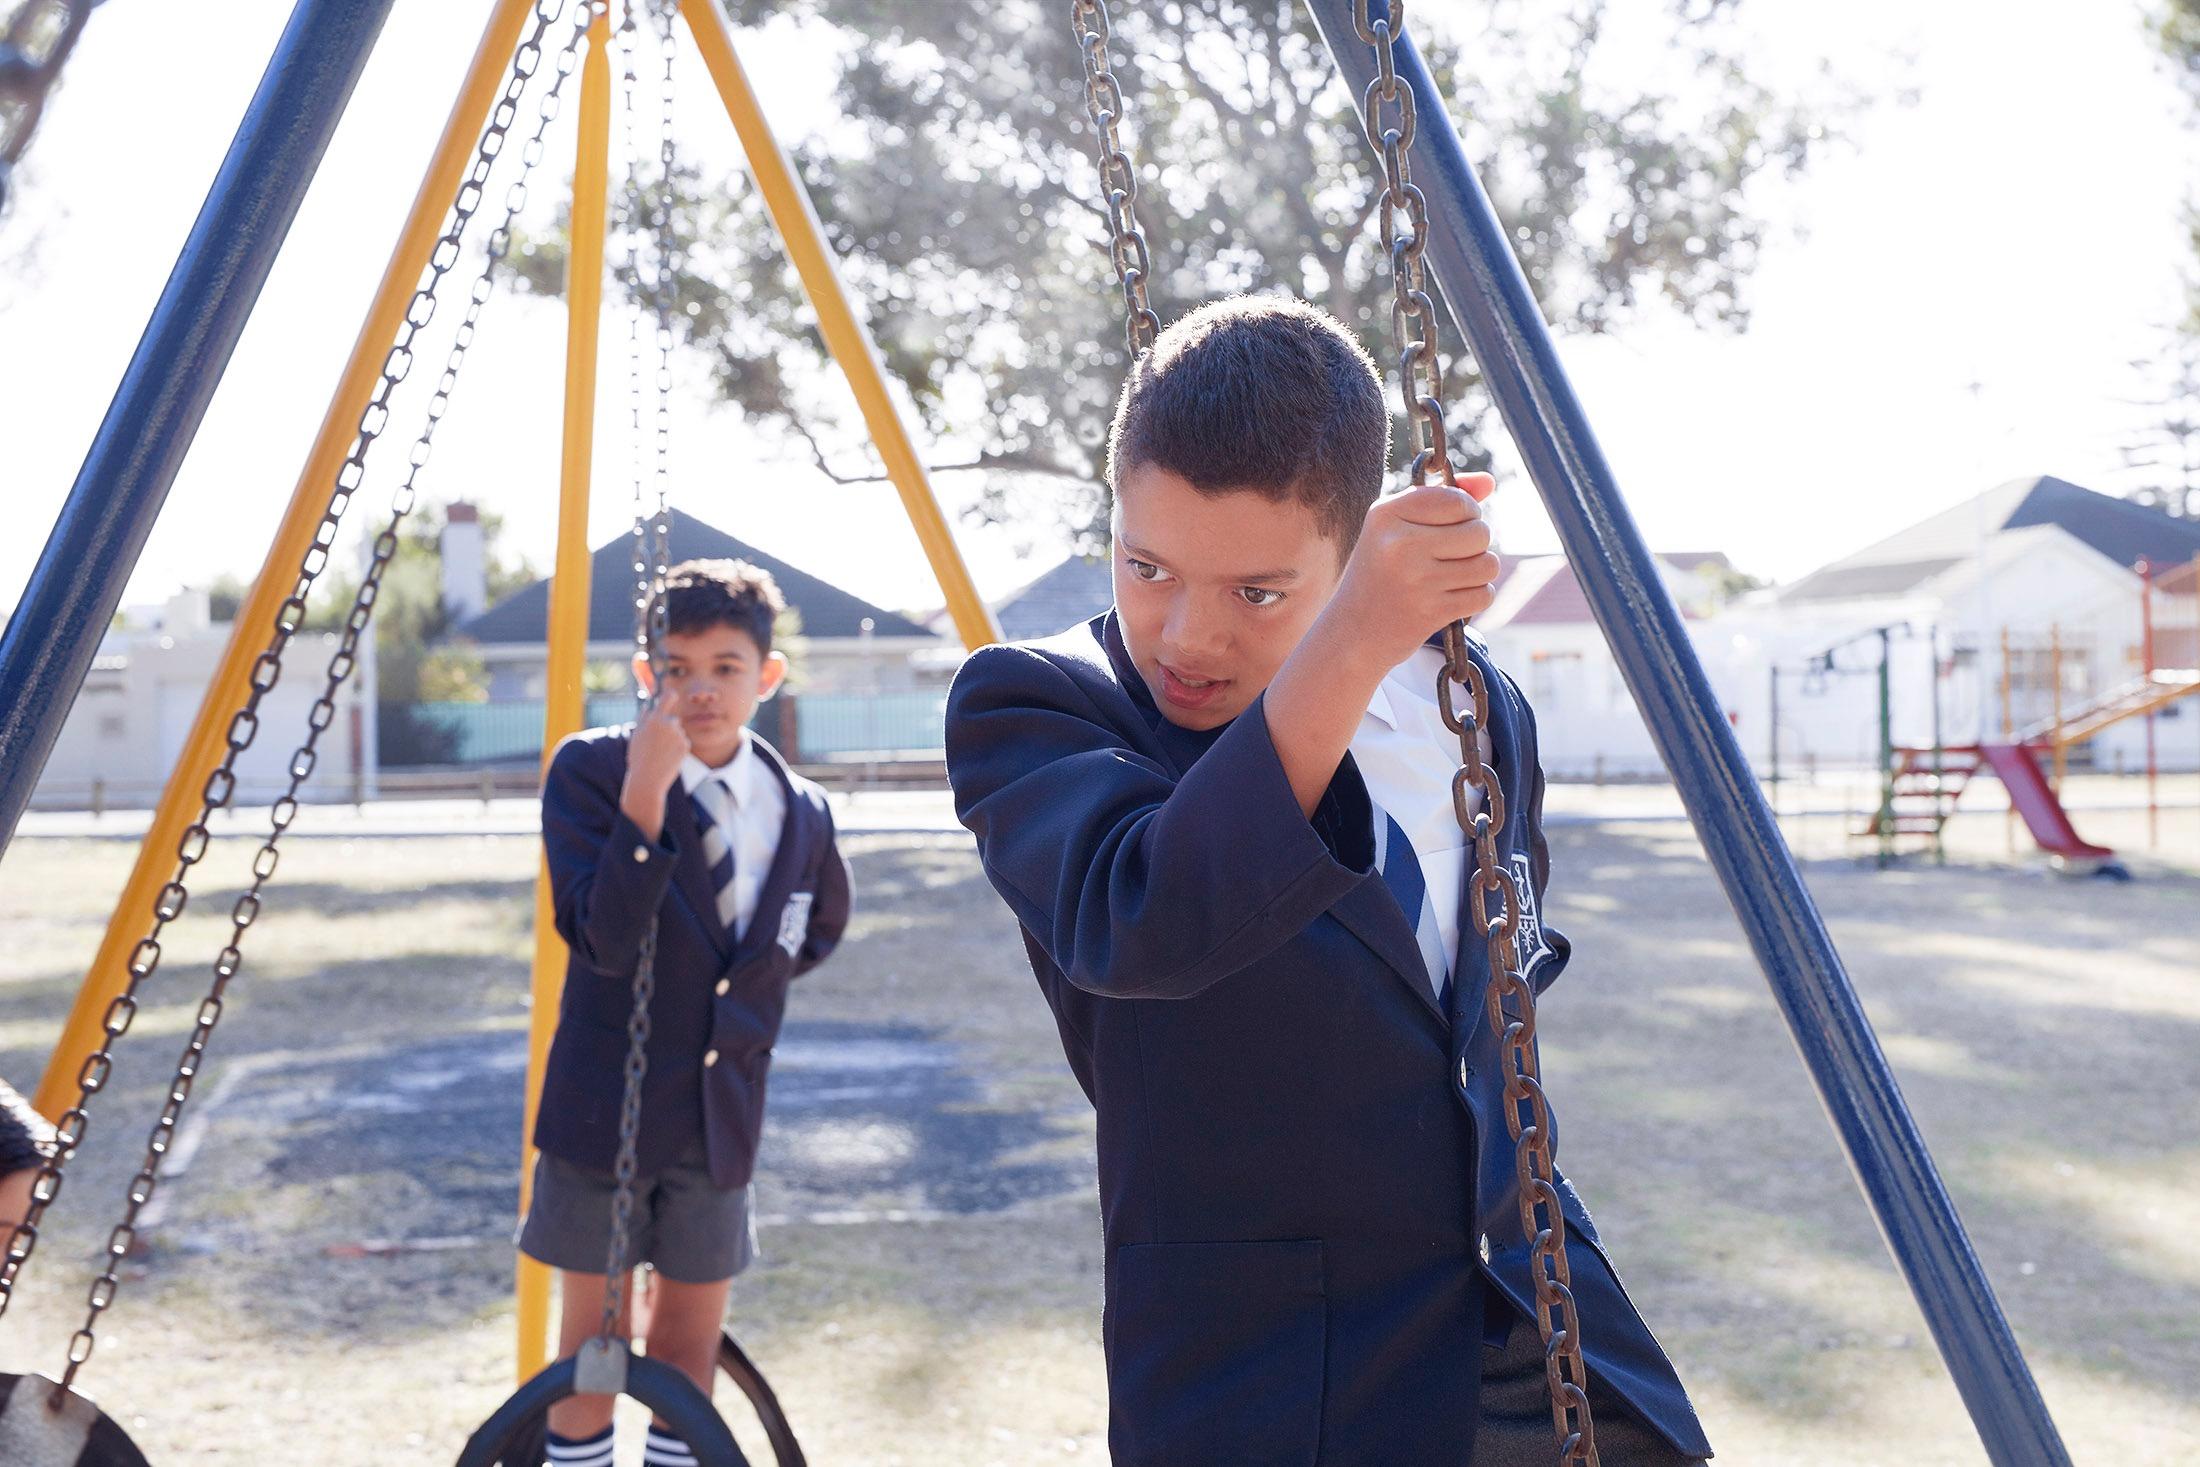 photo photography photographer school uniform education boy boys friends climb climbing playgound